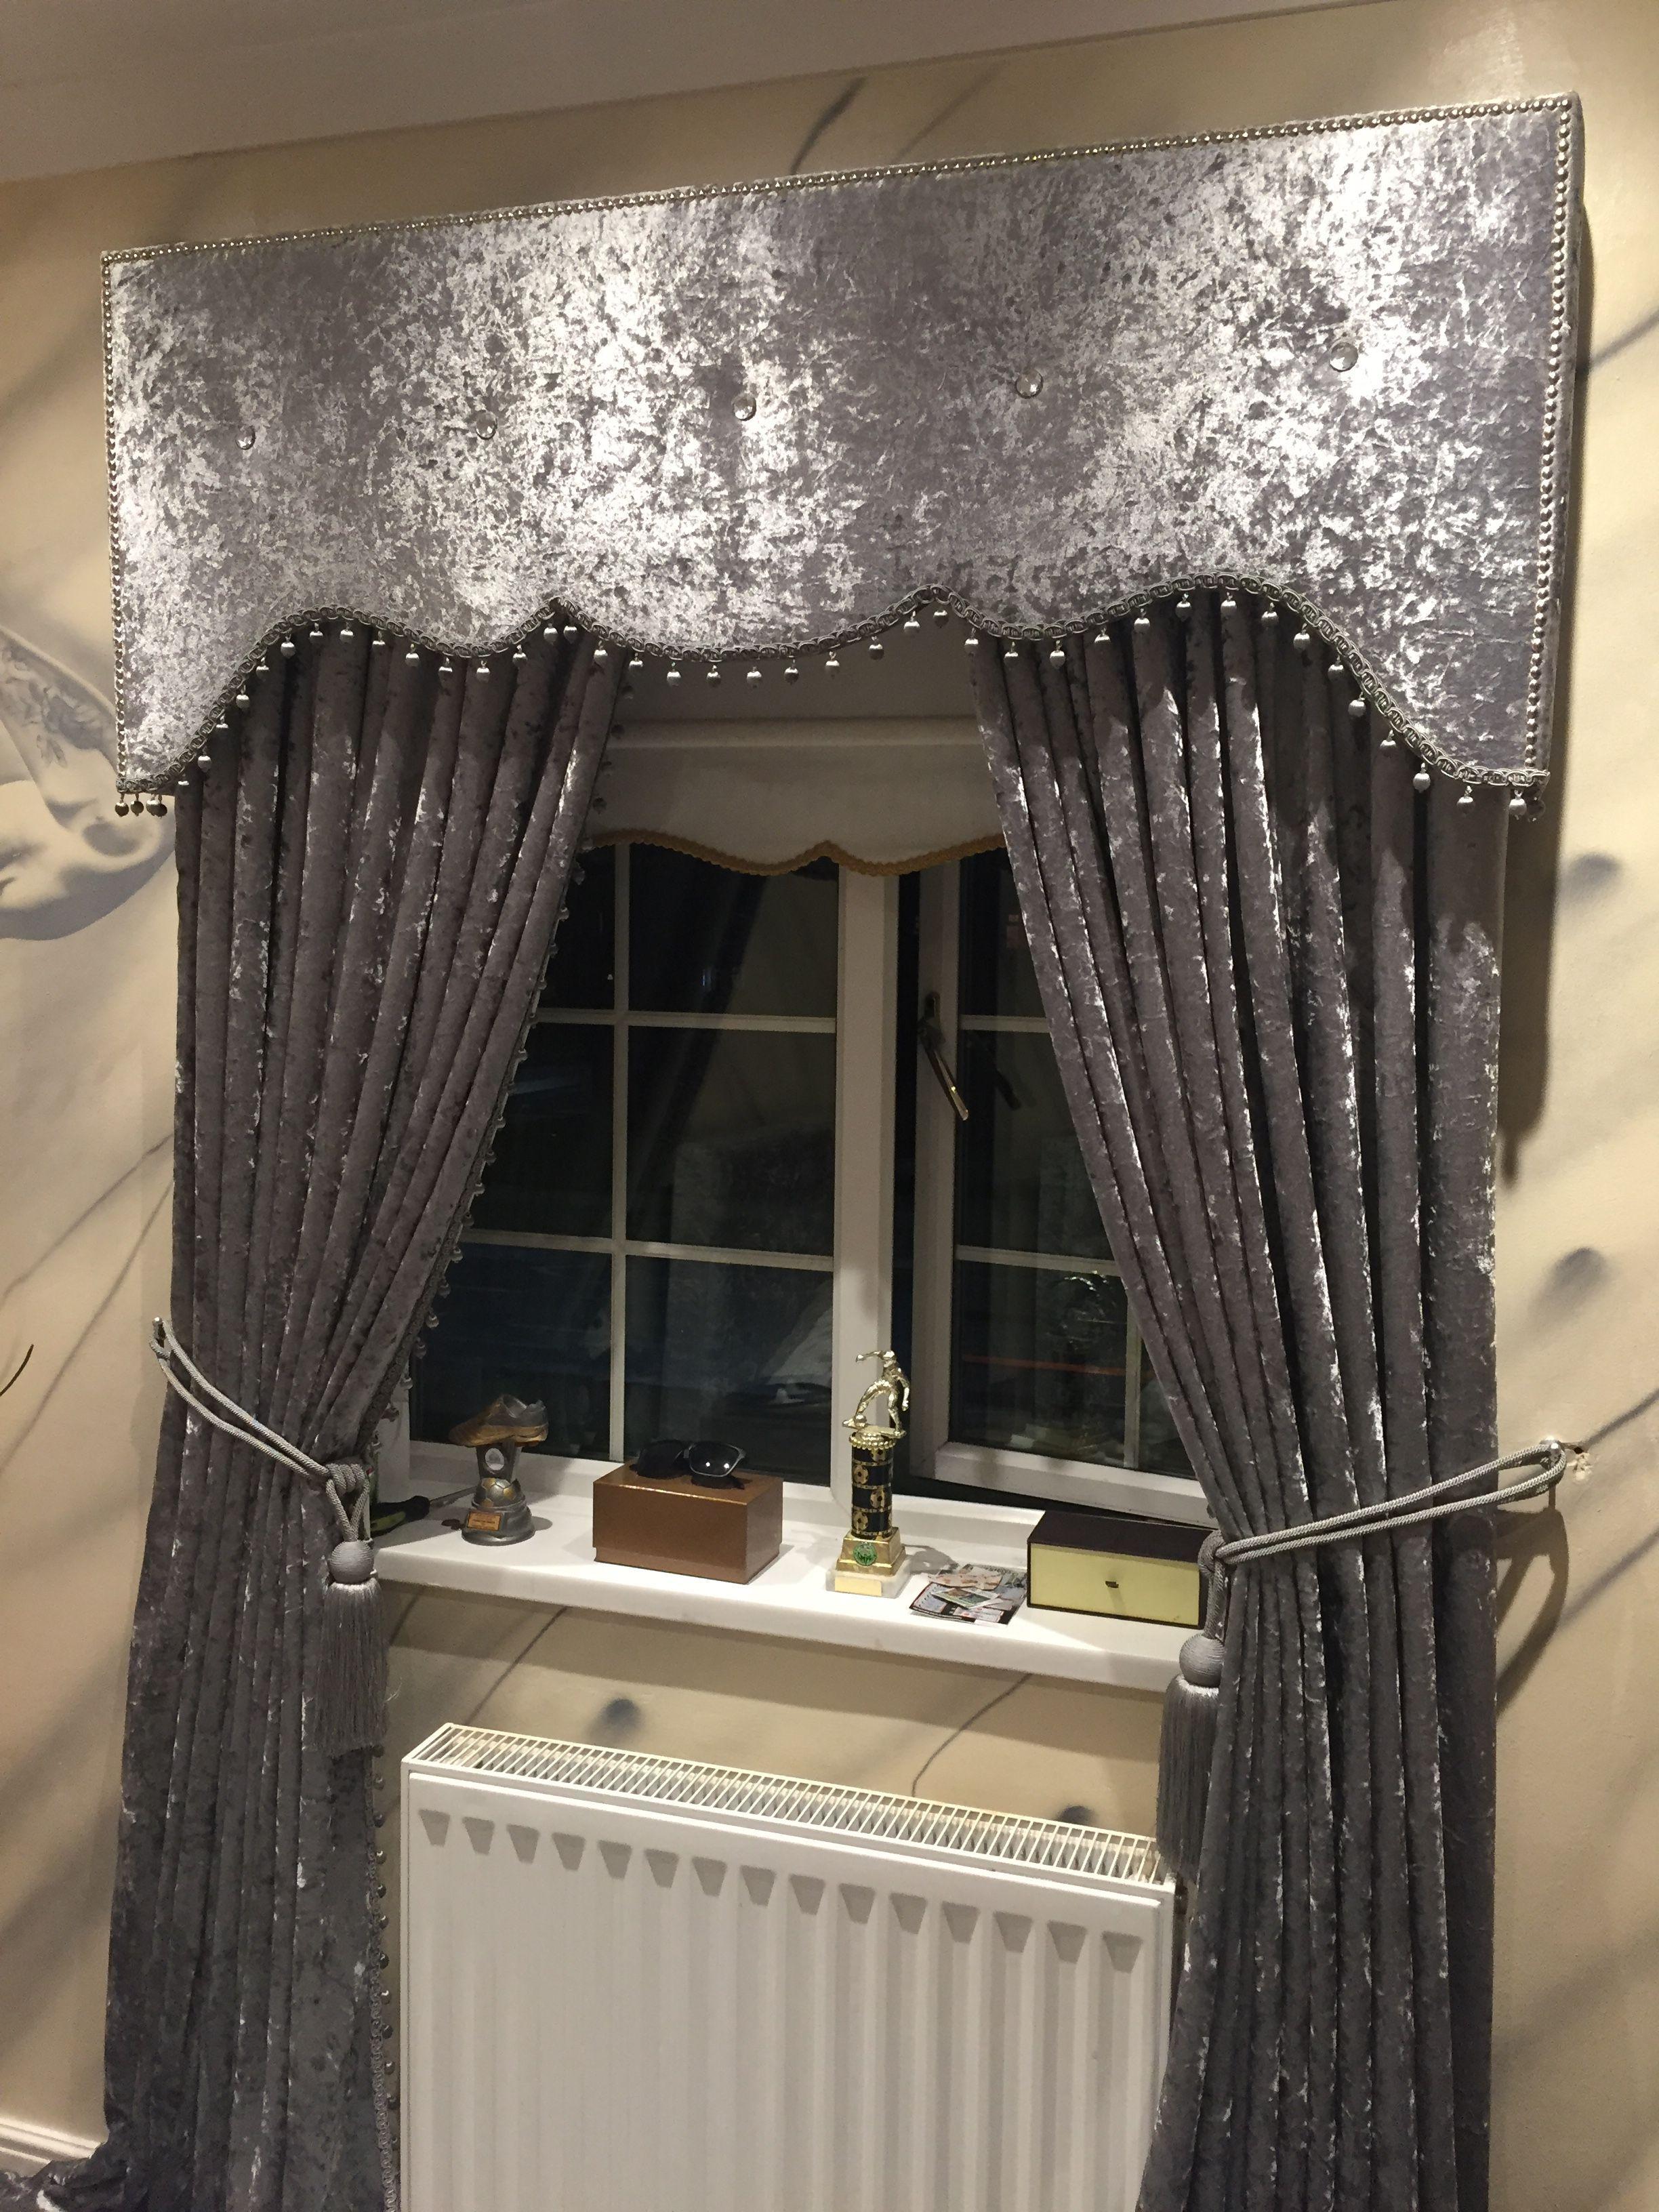 Country curtains livingroom bathroom curtains linenfancy curtains